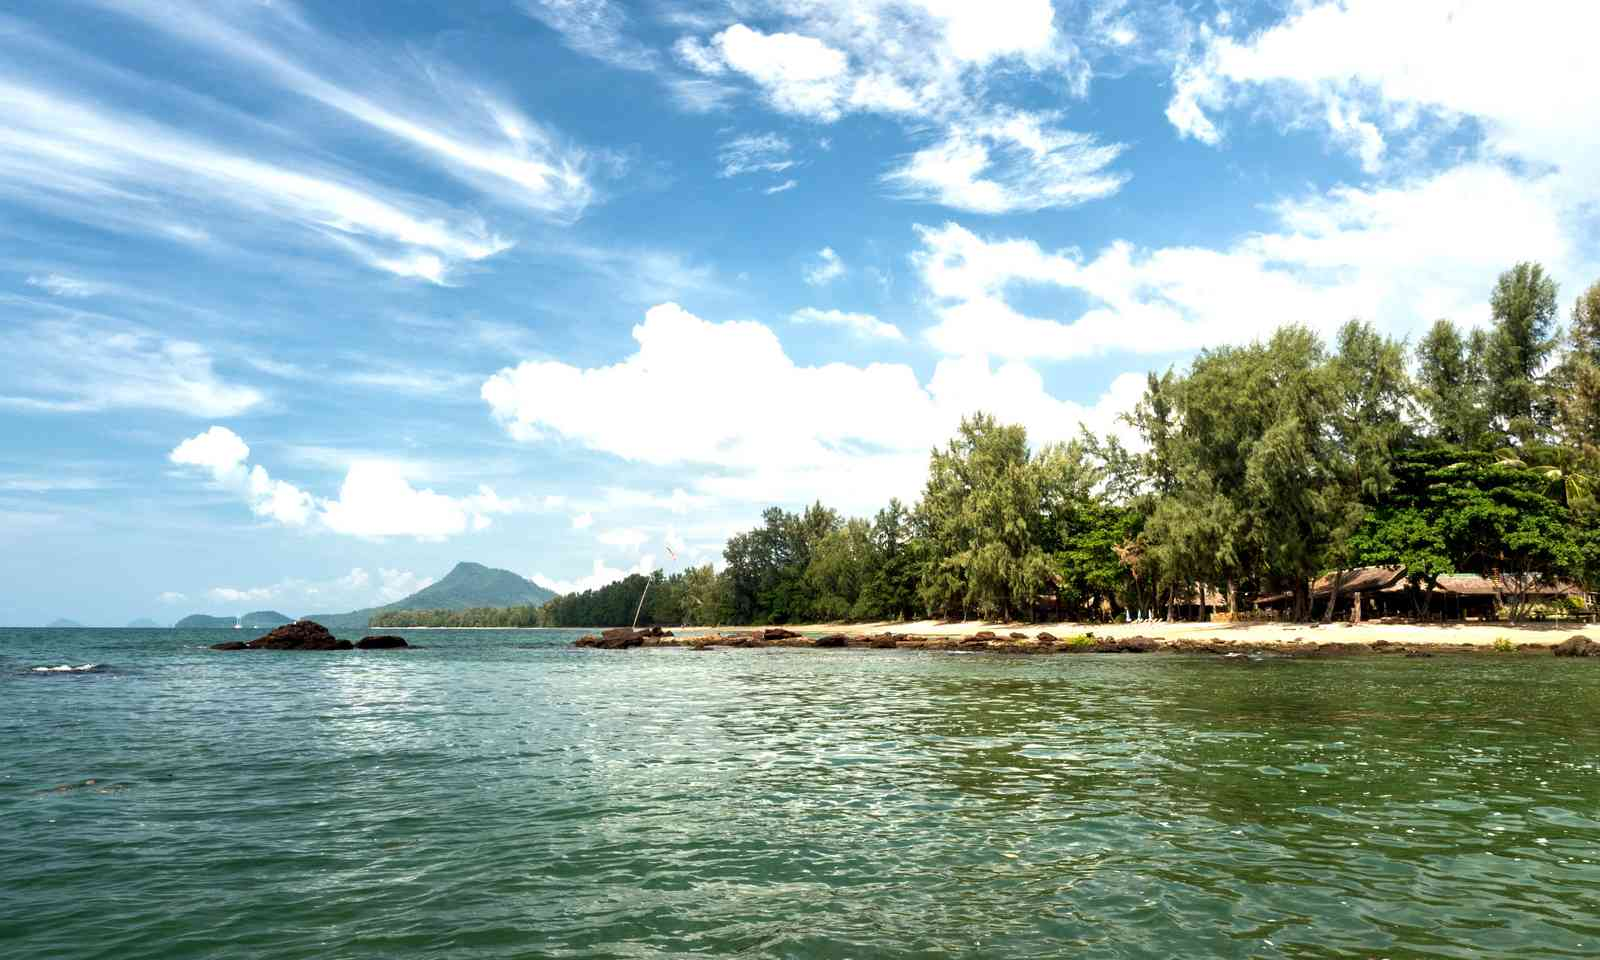 Ko Jum island (Liz Cleere/Jamie Furlong)